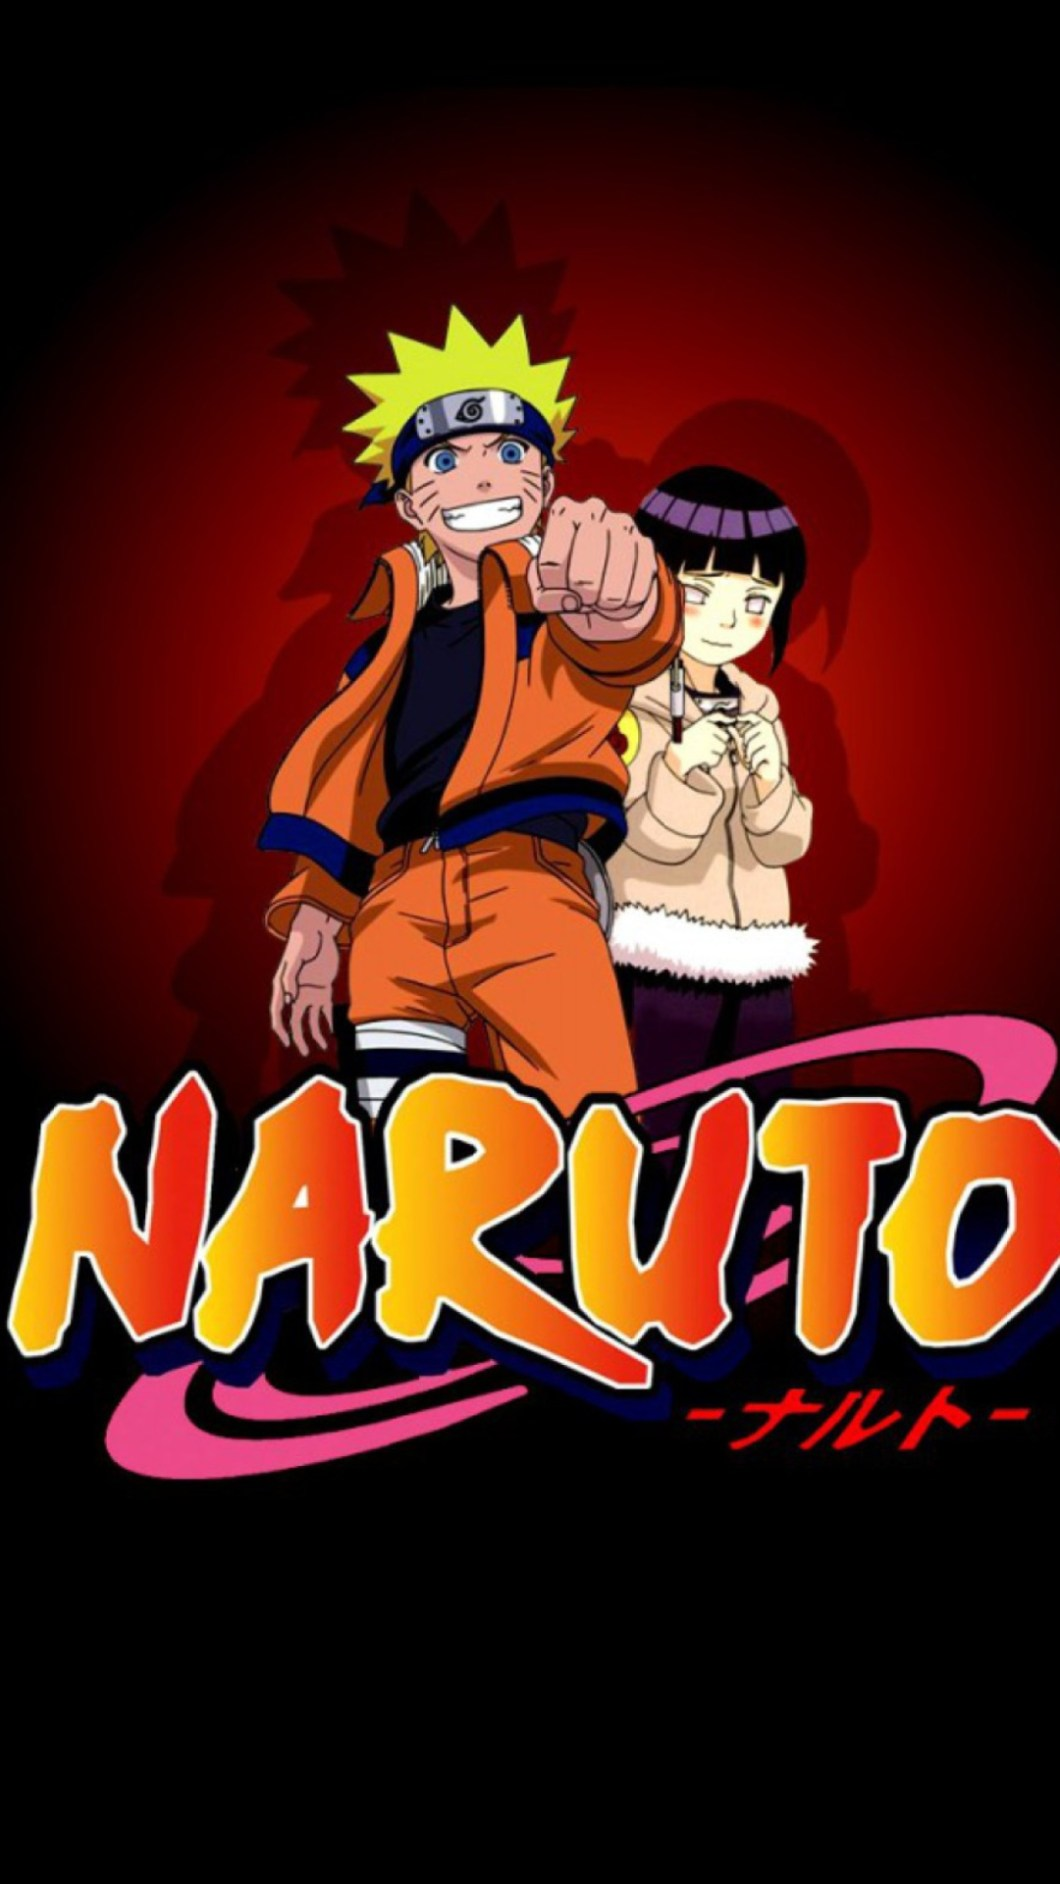 Unduh 440 Koleksi Wallpaper Naruto Full Hd Android HD Gratid